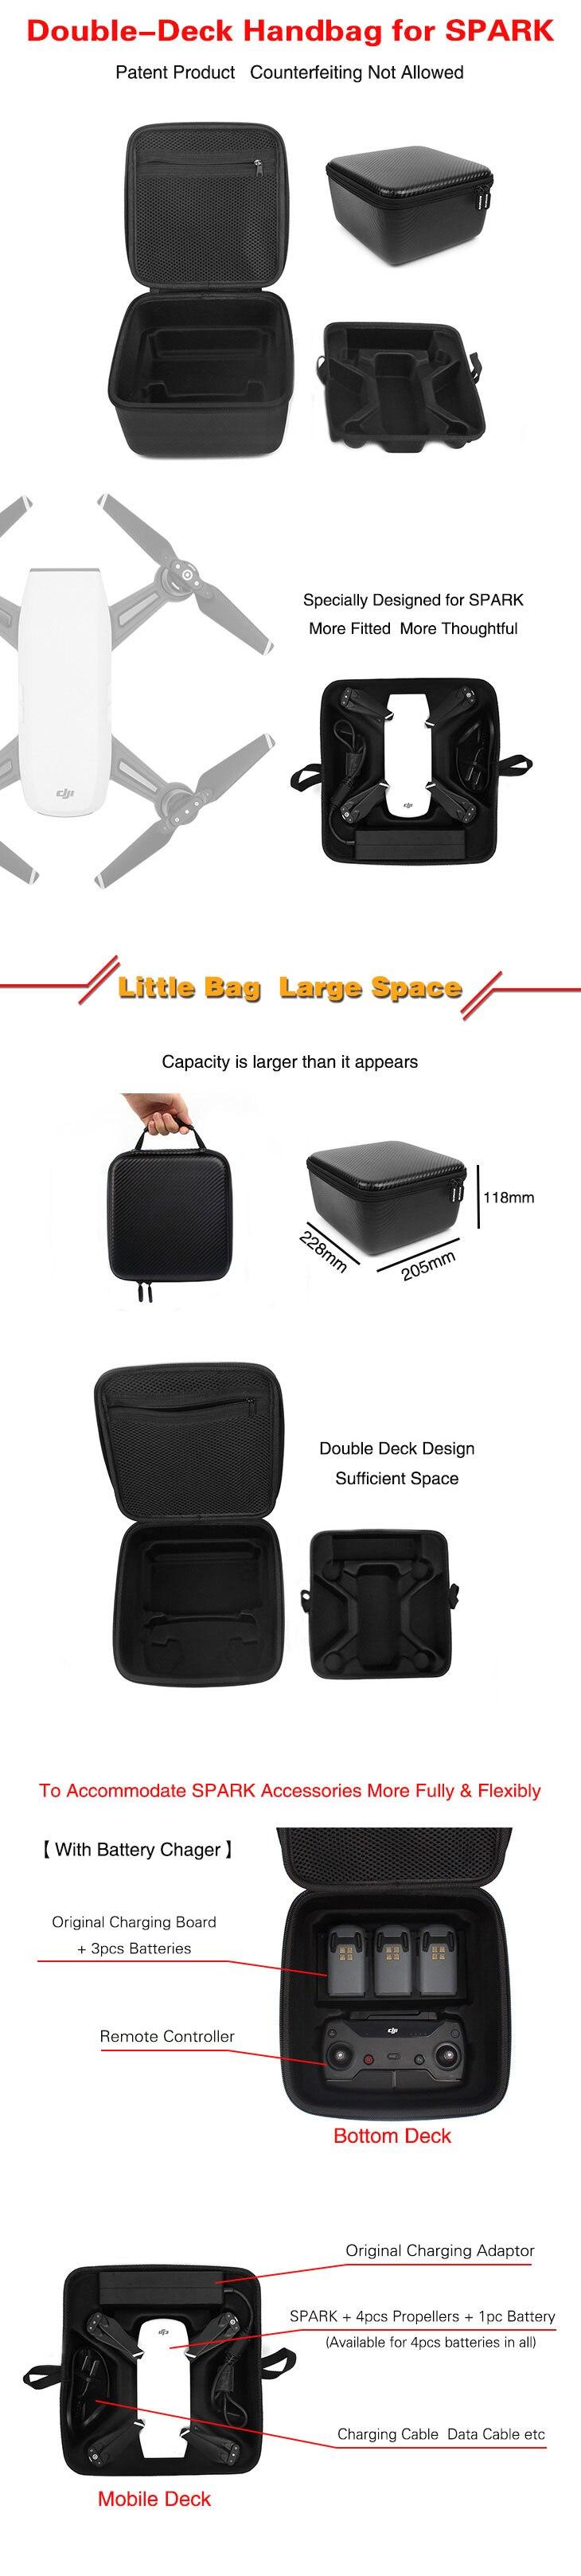 Sunnylife DJI Spark Drone Double Deck Handbag Suitcase PU Waterproof Aircraft Portable Storage Bag for DJI Spark Accessories